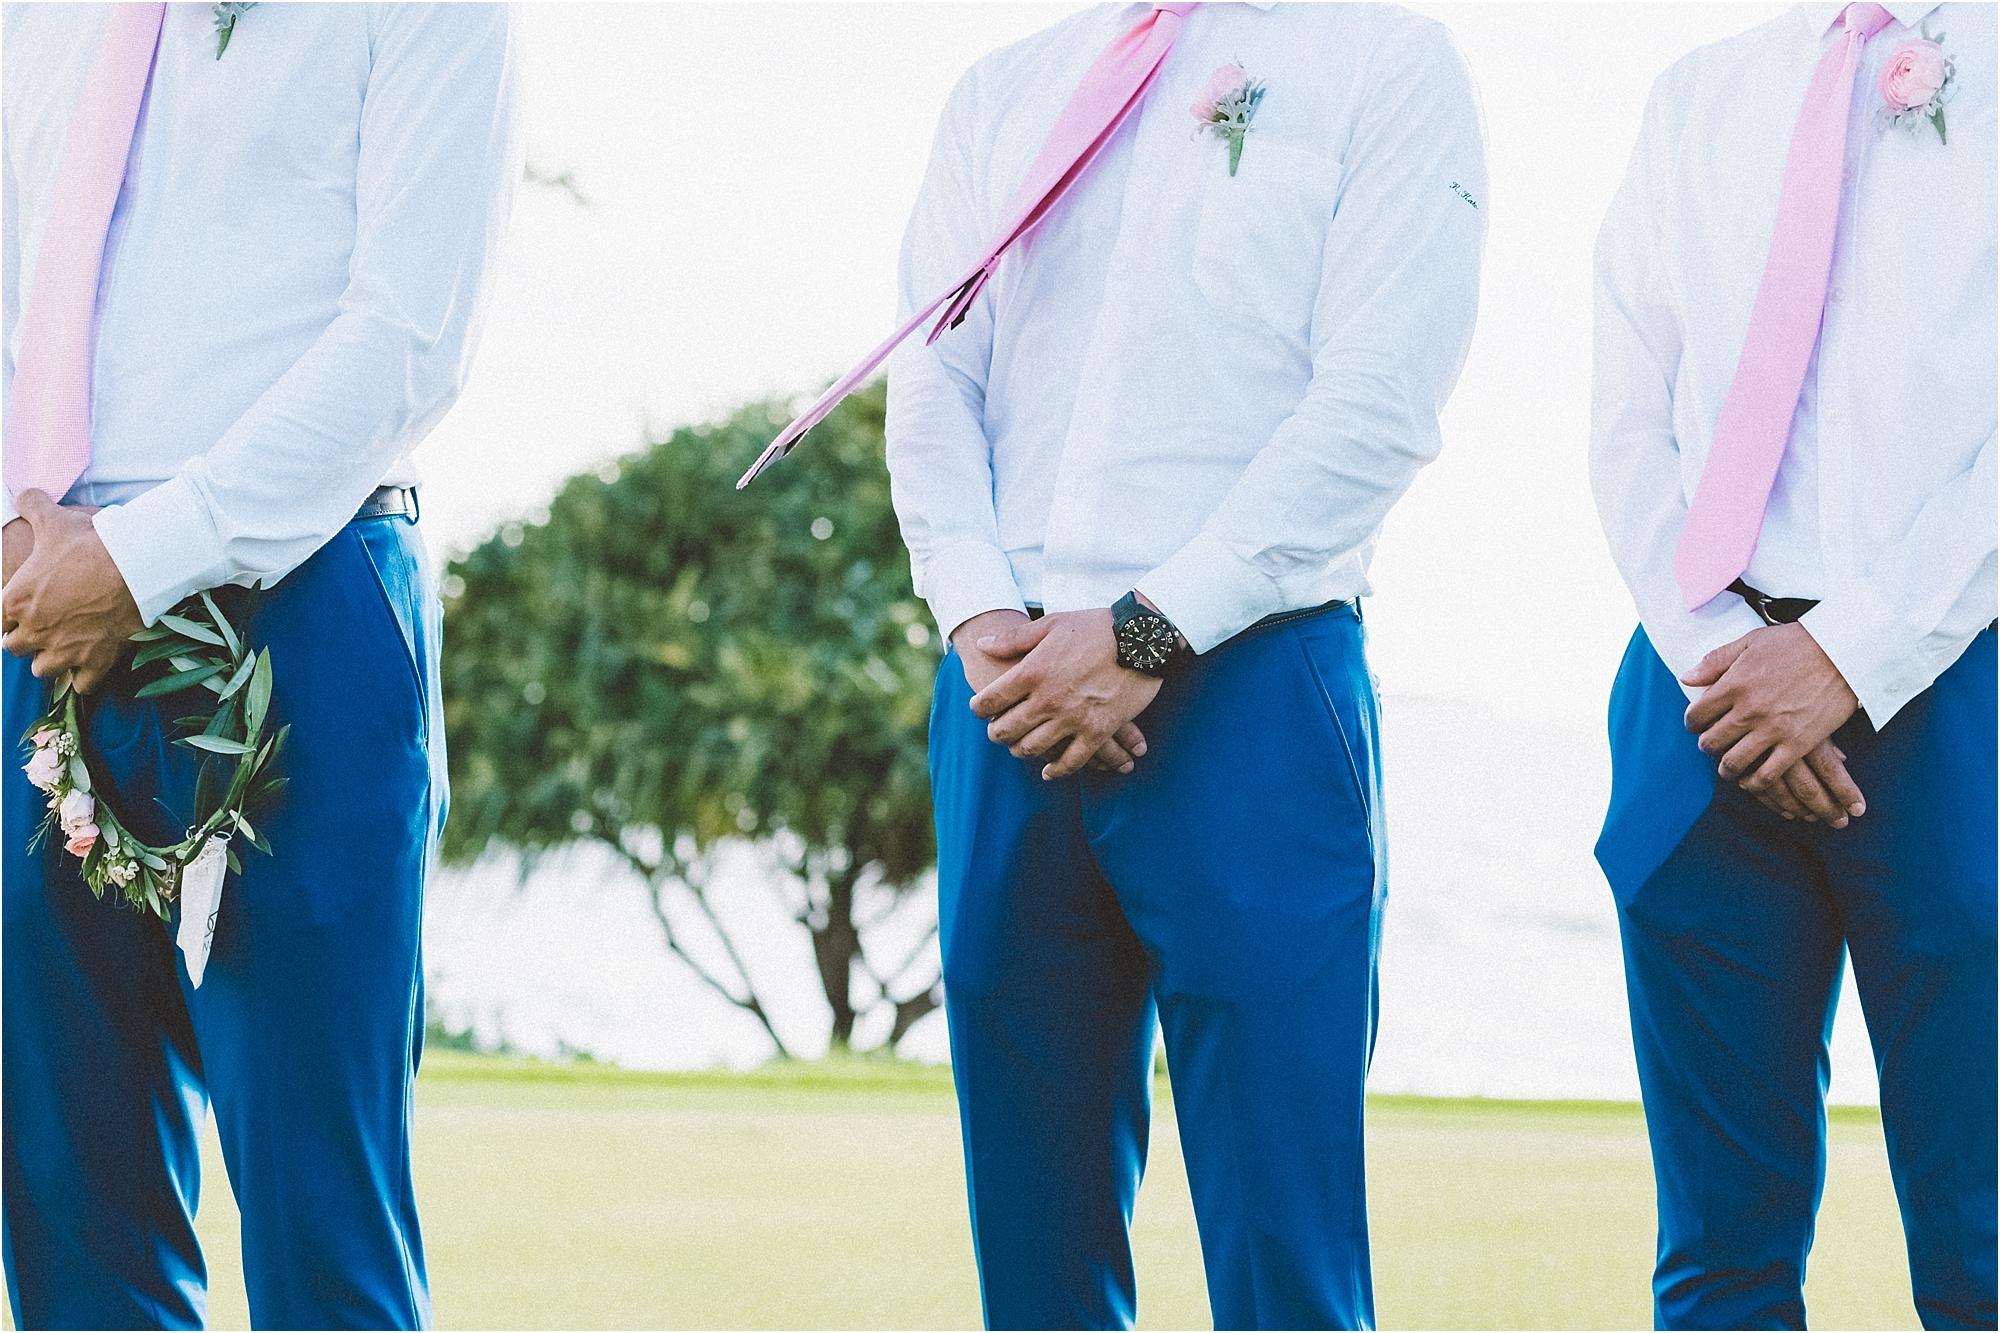 angie-diaz-photography-maui-hawaii-destination-wedding-makena-golf-beach-club_0028.jpg